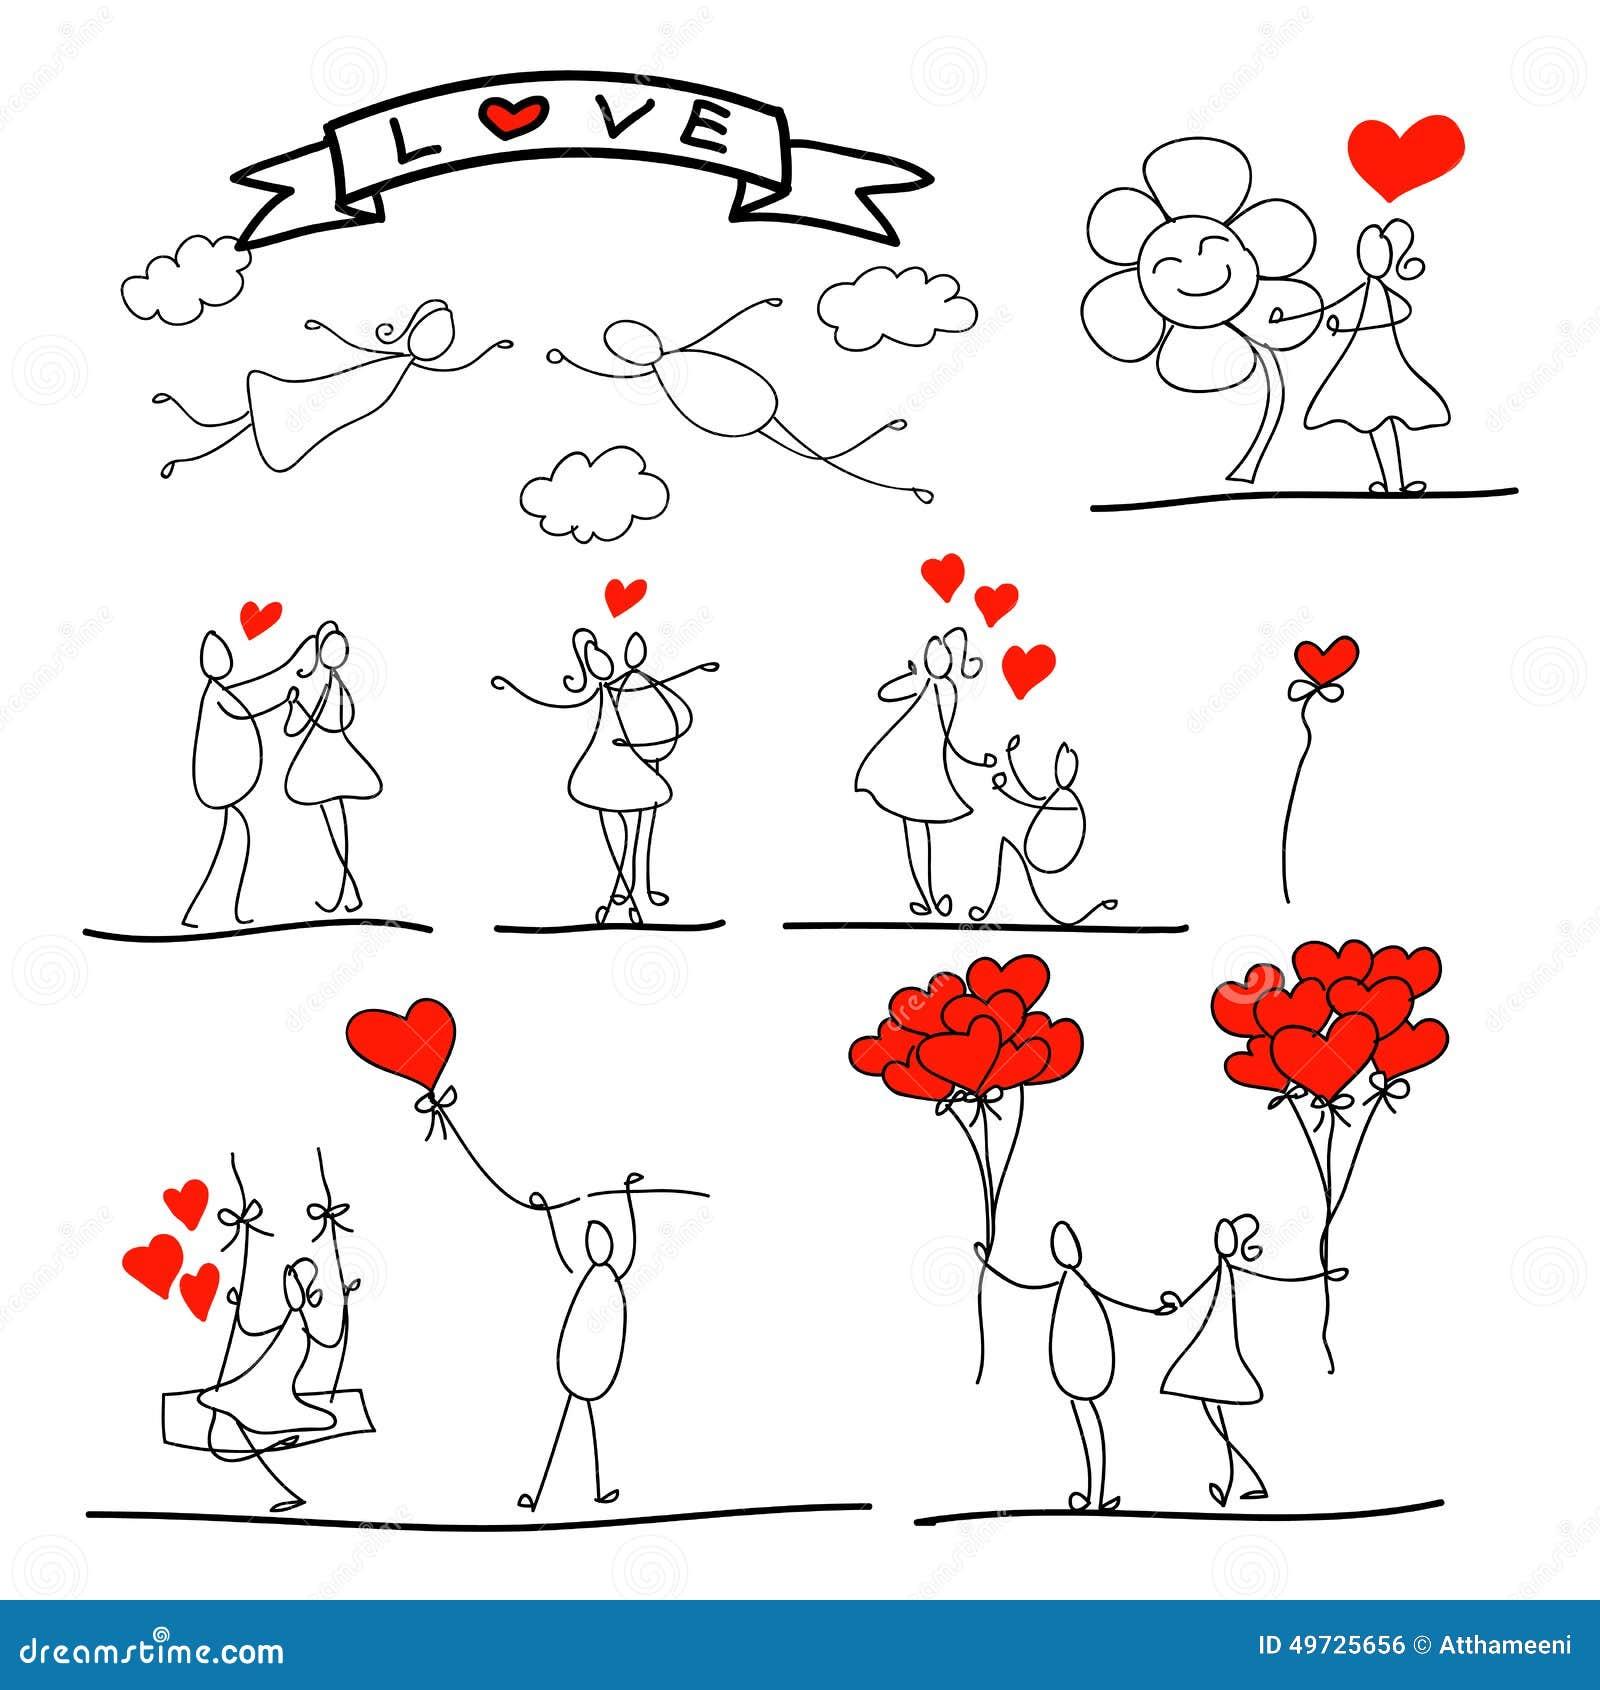 Cartoon Hand Drawn Abstract Love Character Stock Vector Image 49725656